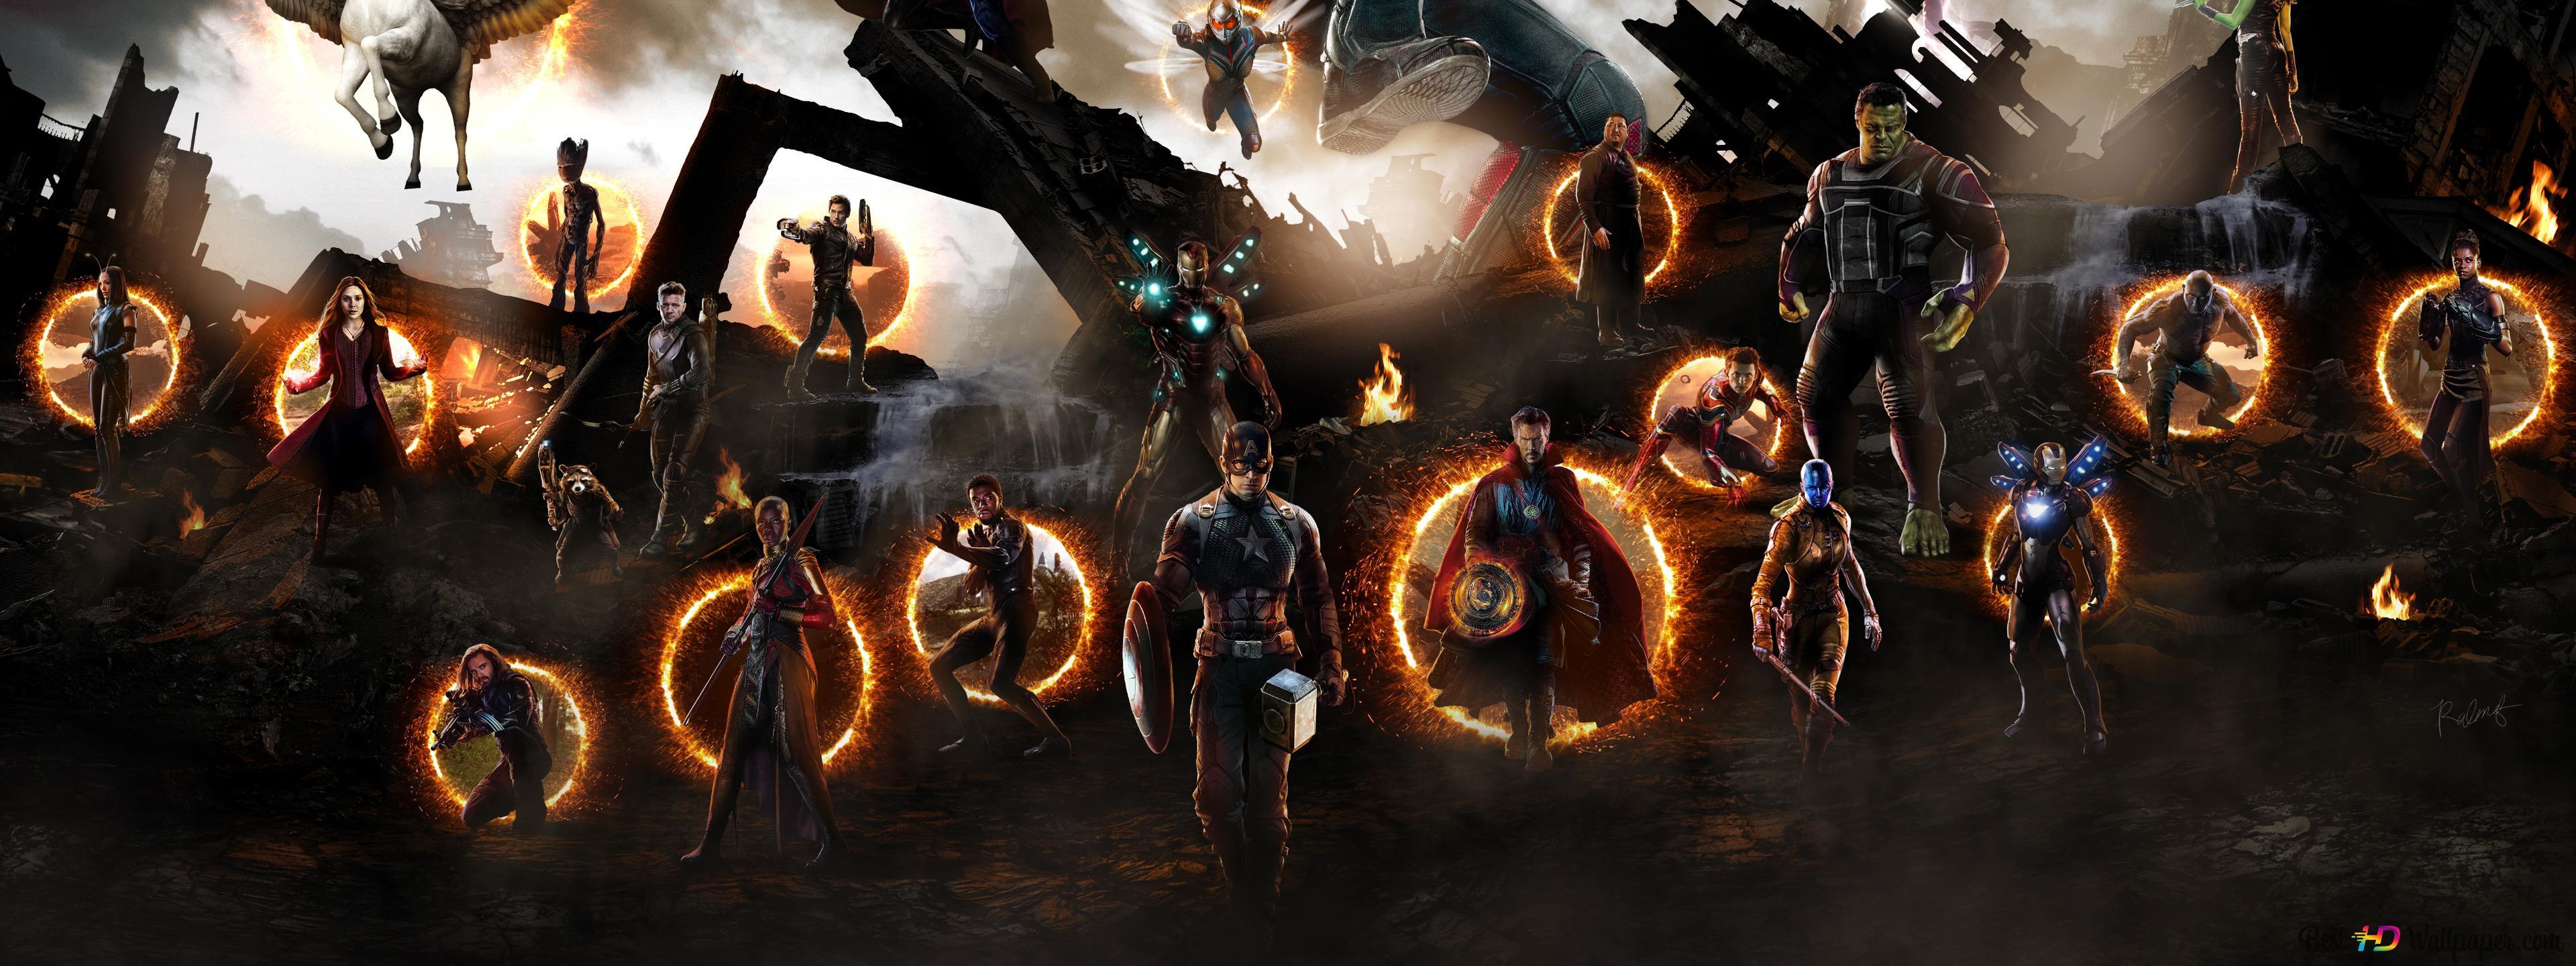 Avengers Endgame Assemble Hd Wallpaper Download